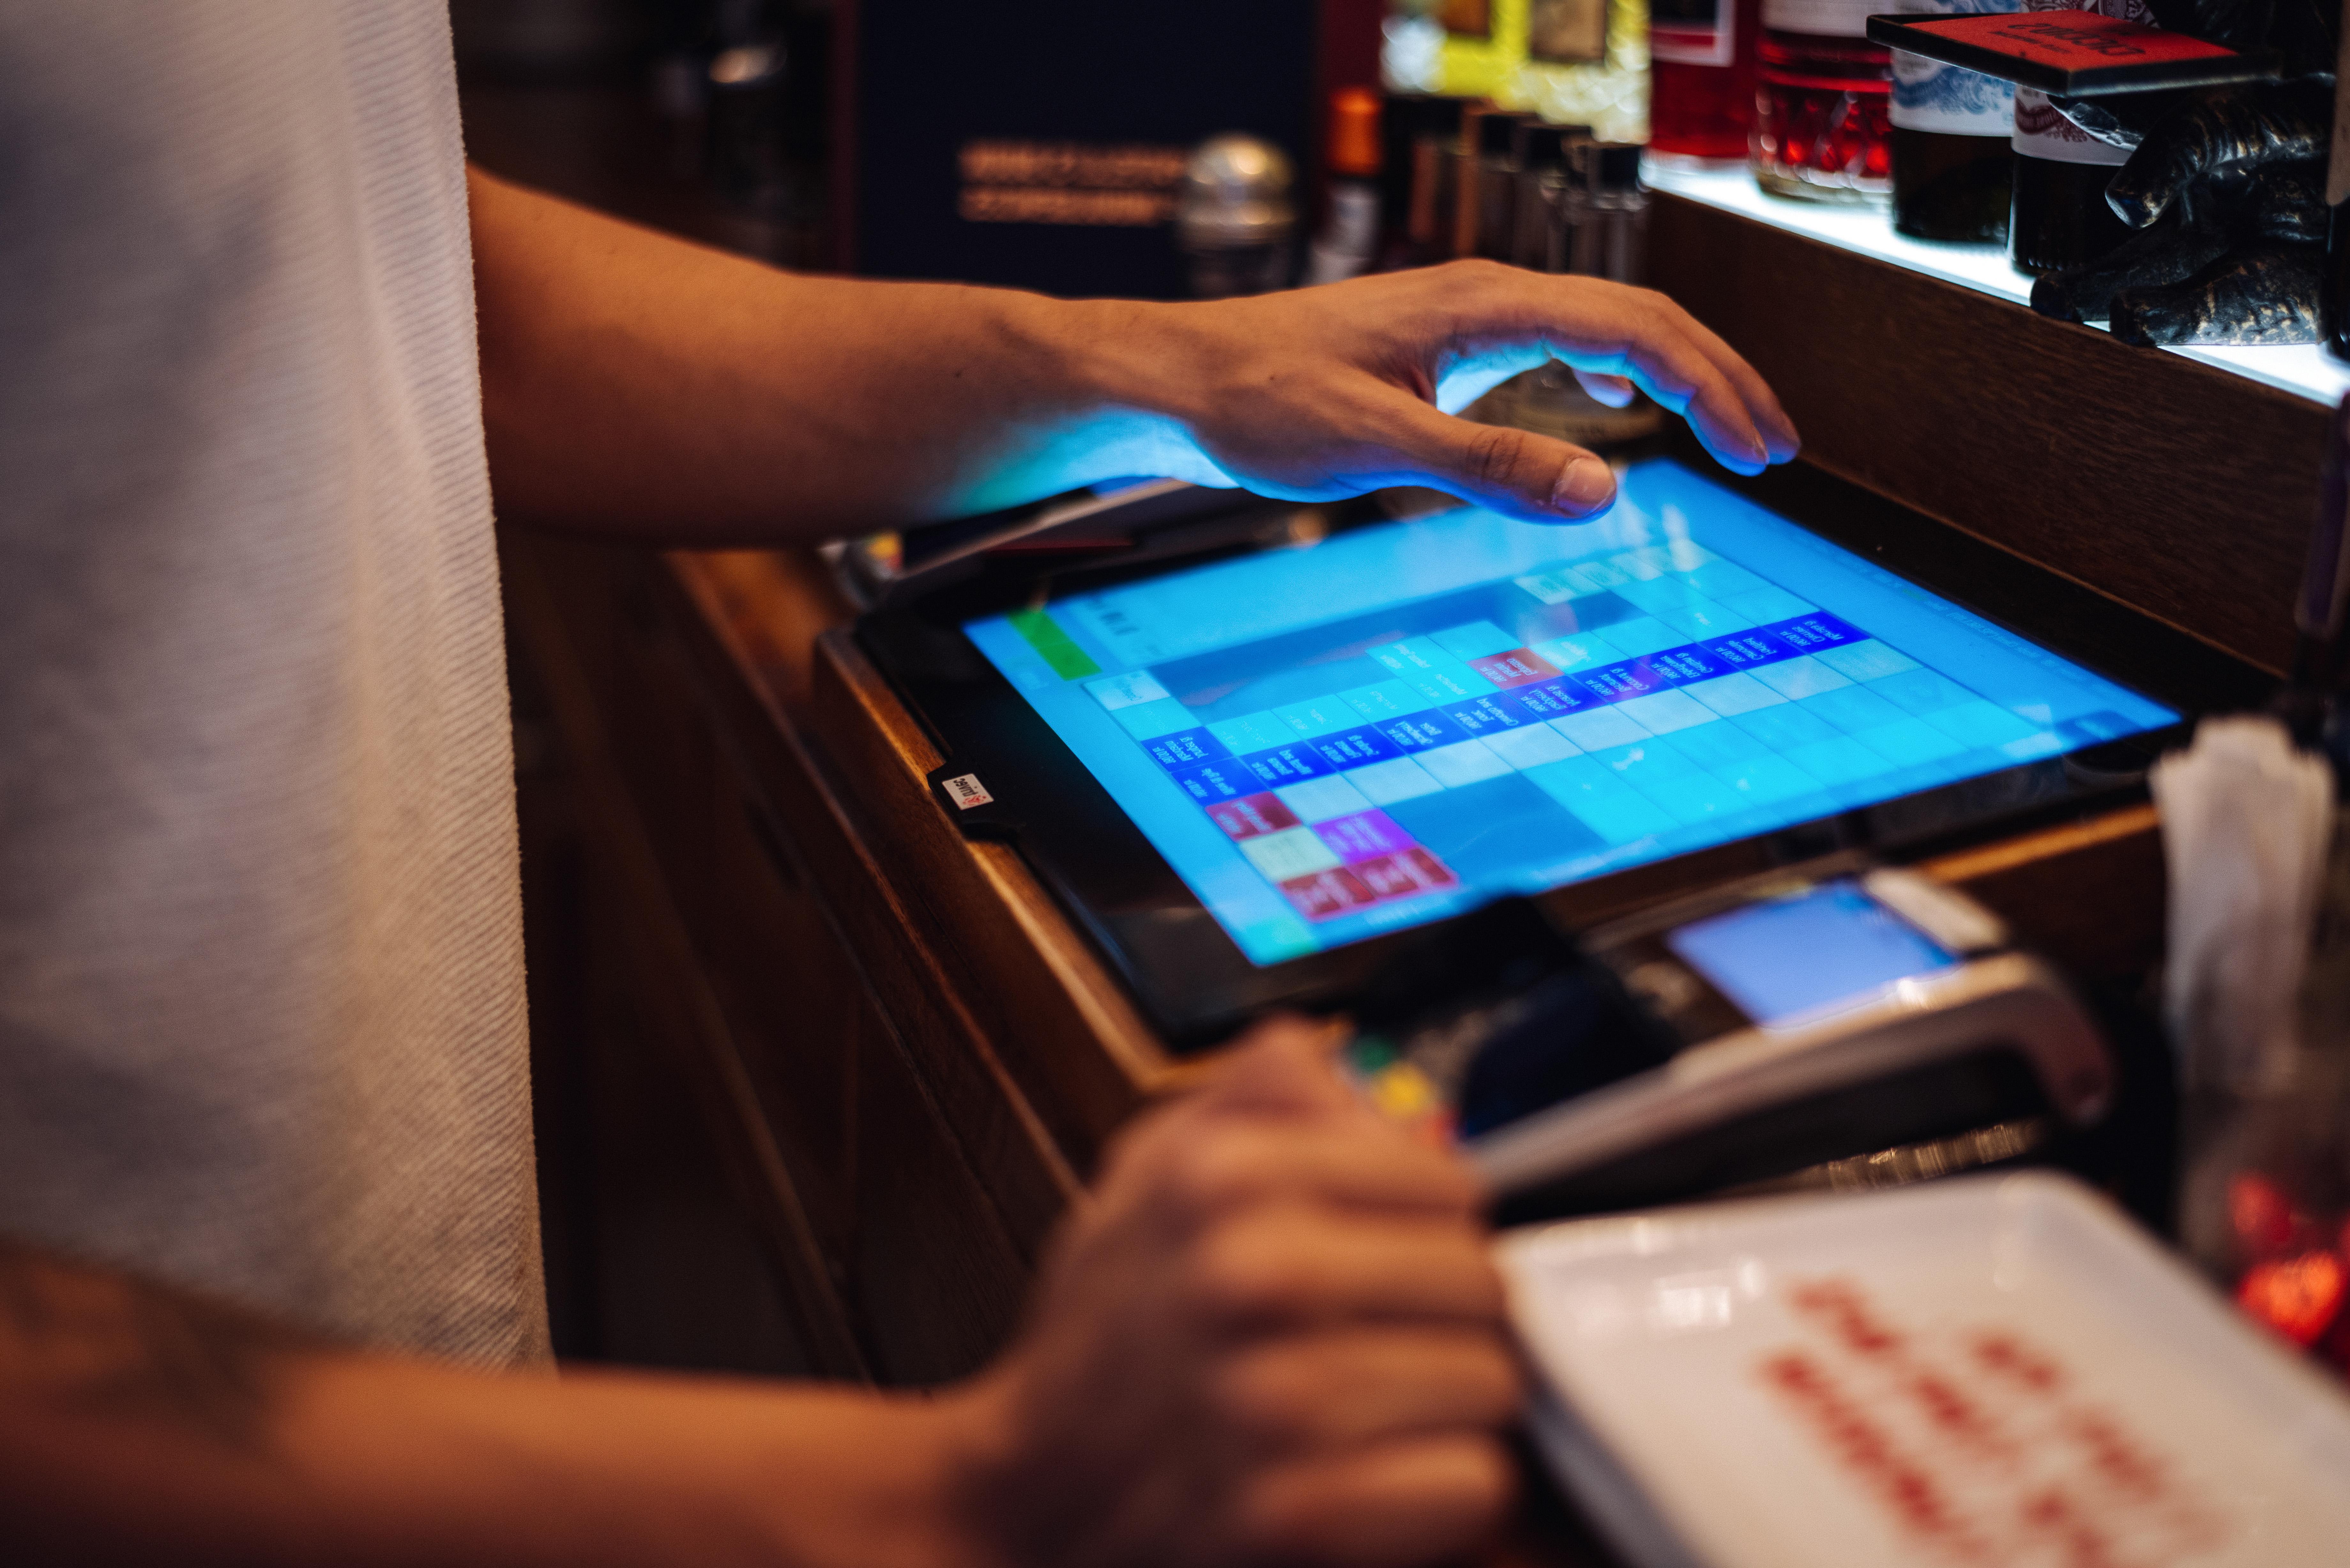 POS system for restaurants bars and cafés